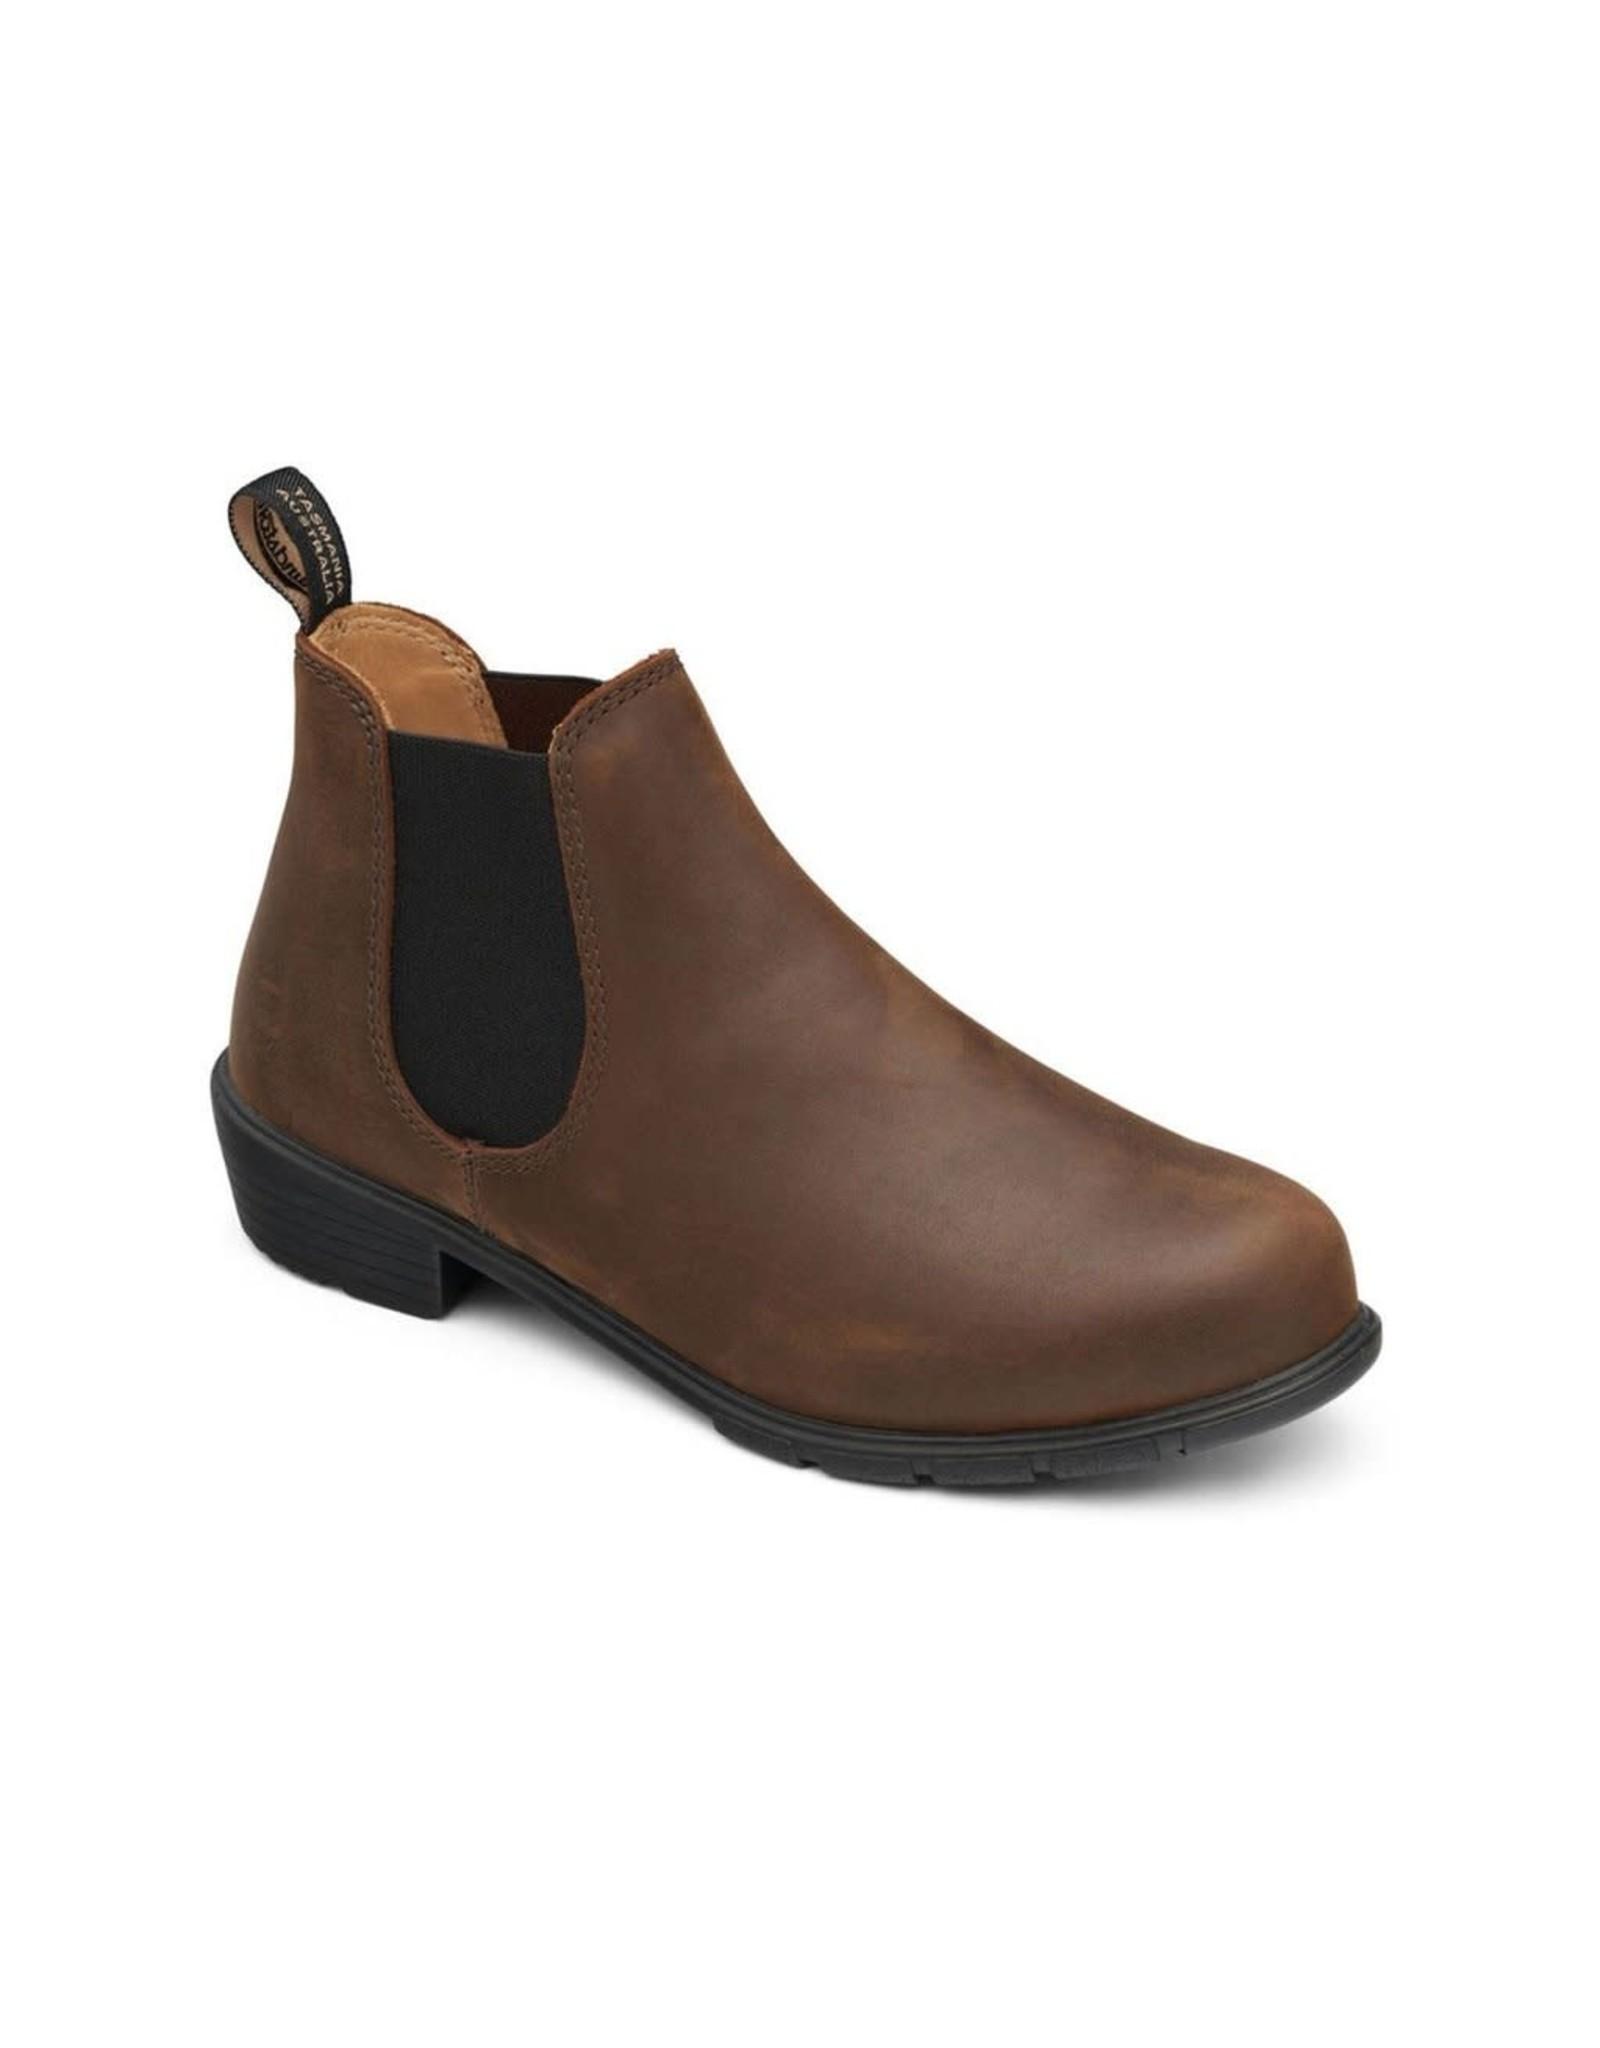 Blundstone Blundstone - Low Heel Antique Brown (1970)